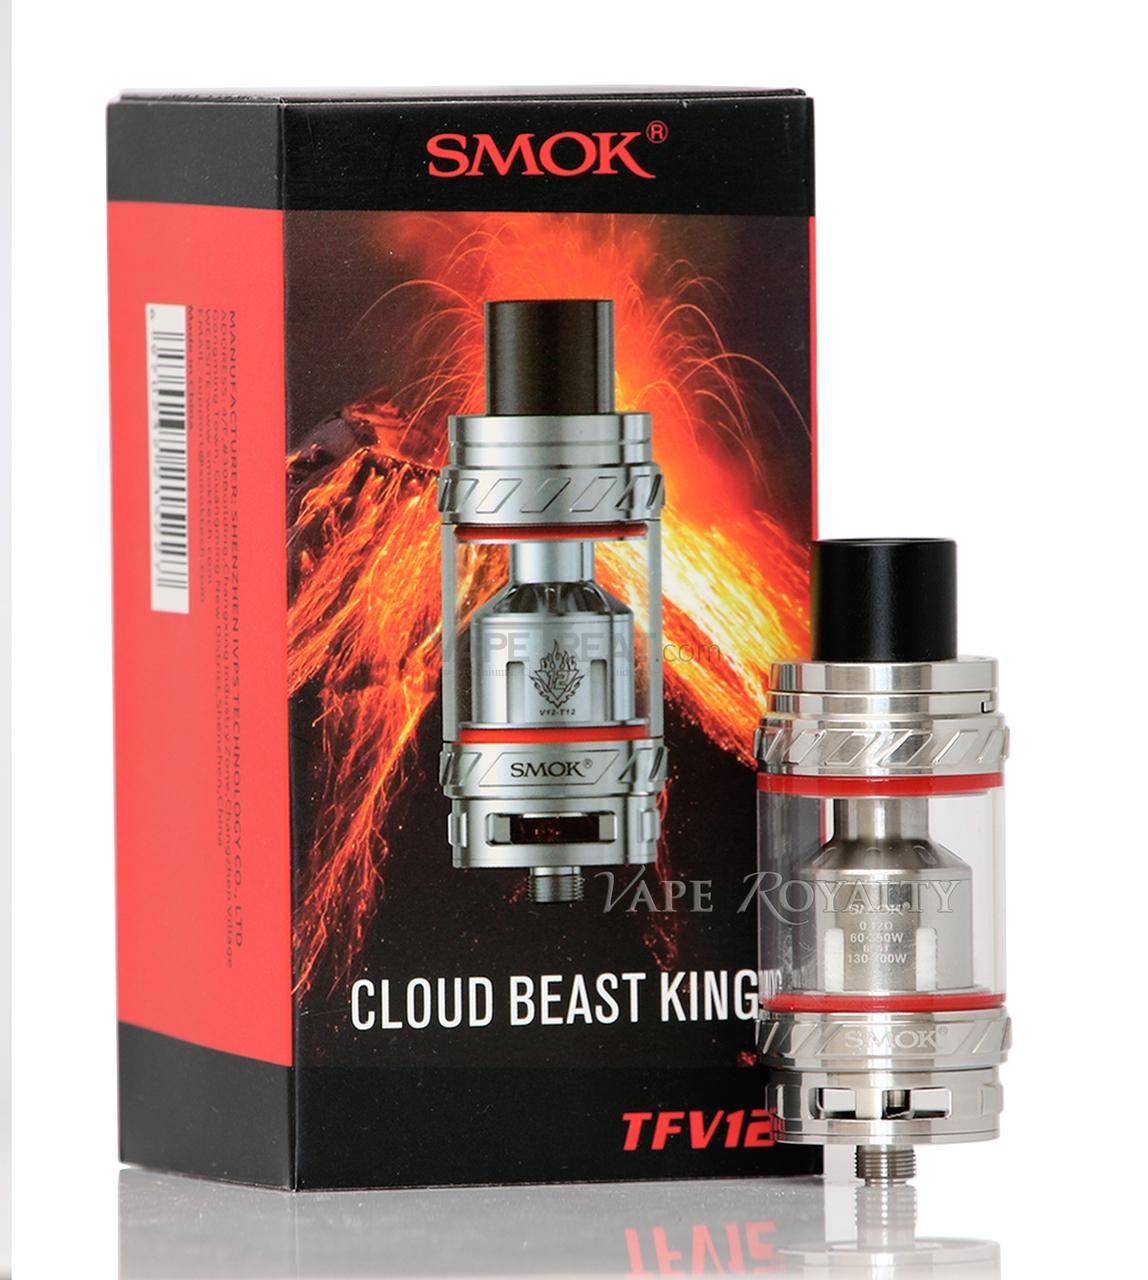 tfv12 cloud beast king(guld)